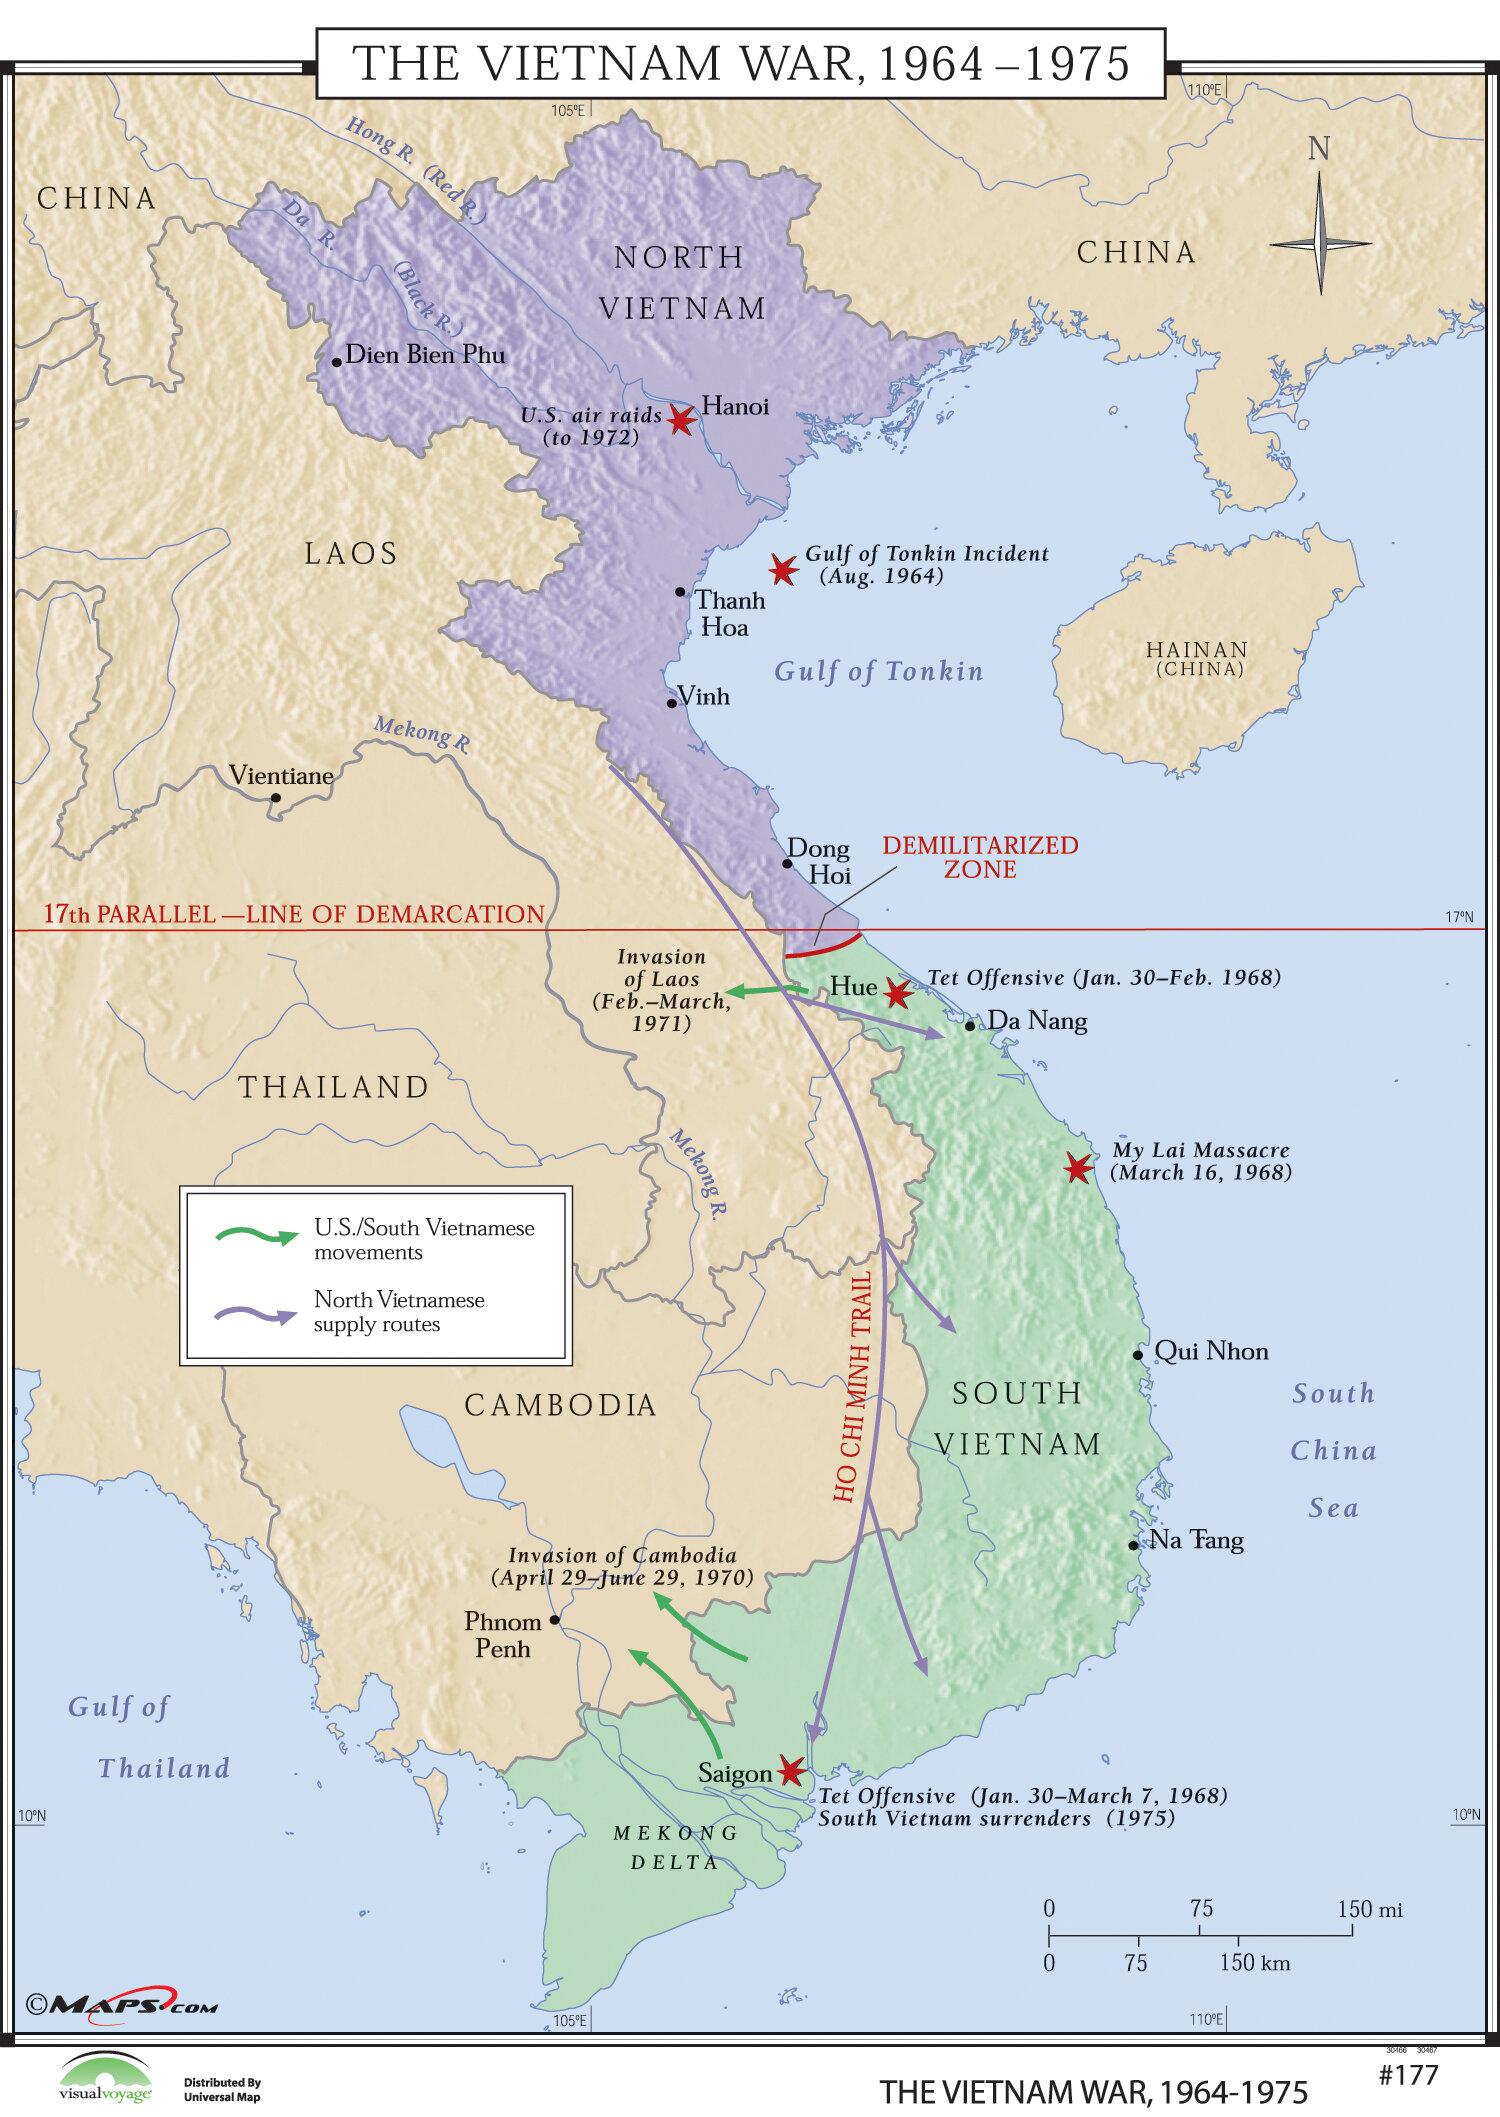 Universal map world history wall maps vietnam war 1964 75 wayfair gumiabroncs Image collections